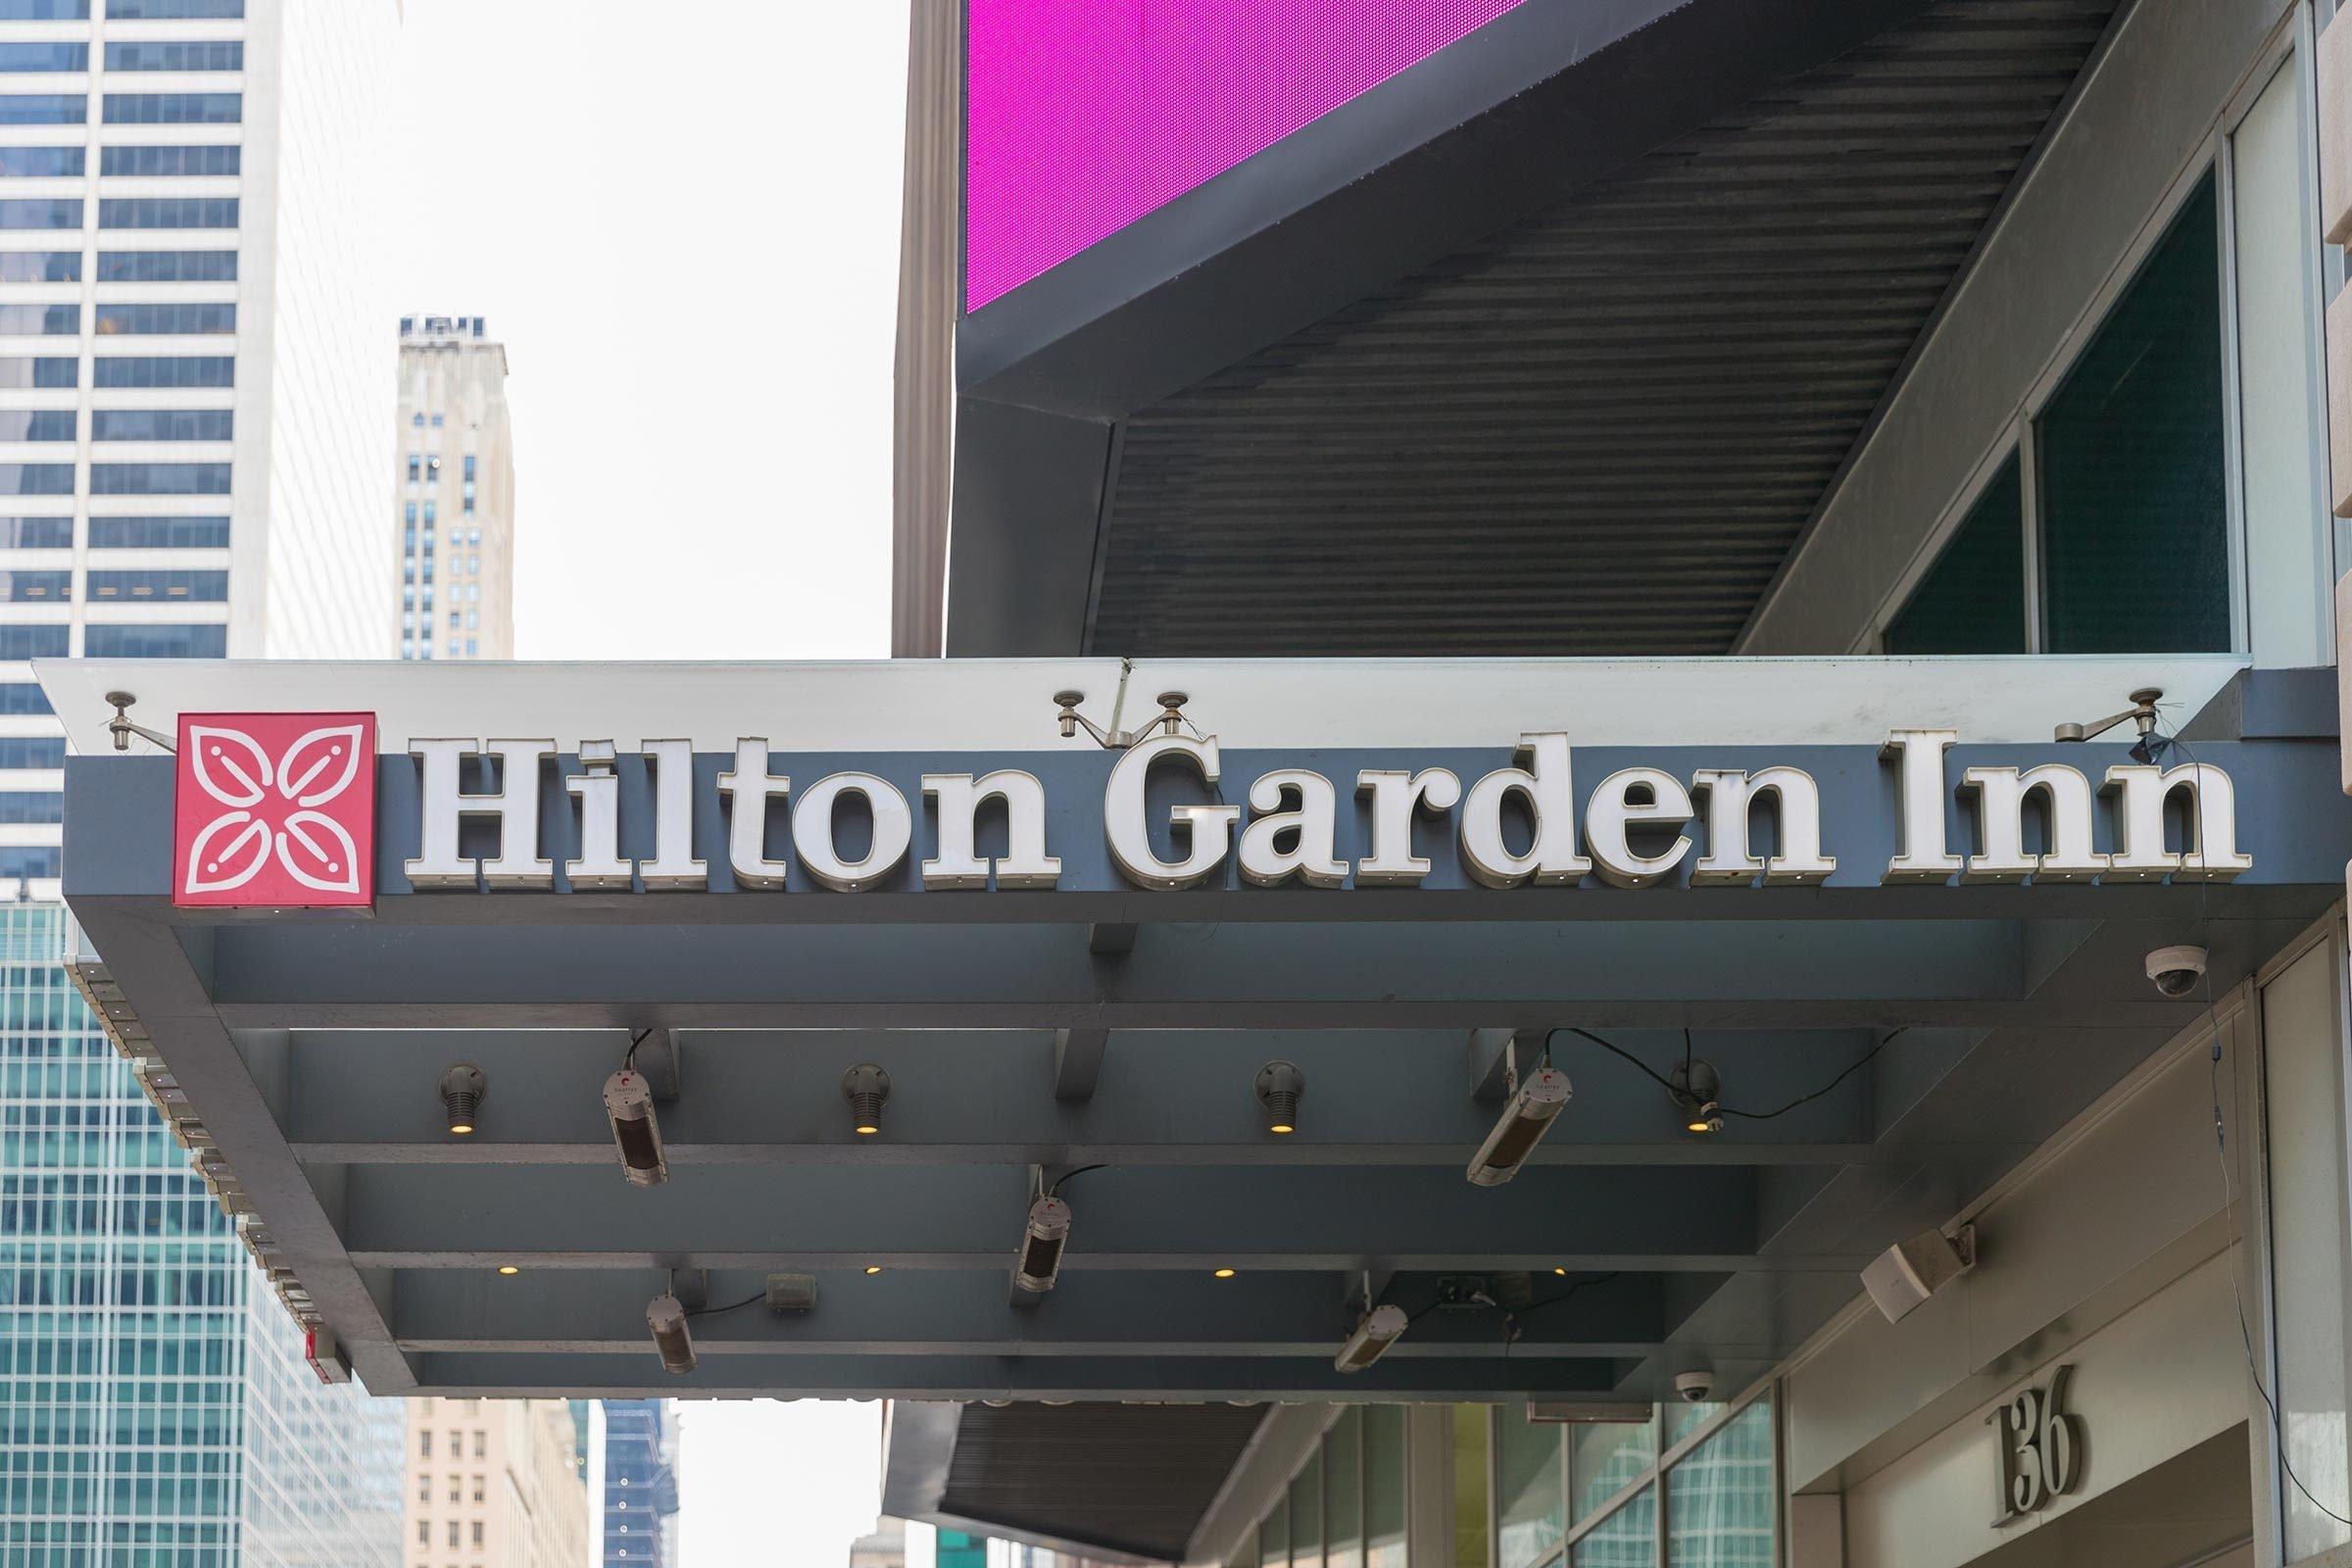 New York, United States, August 18, 2018:Hilton Garden Inn in New York city, Times Square.